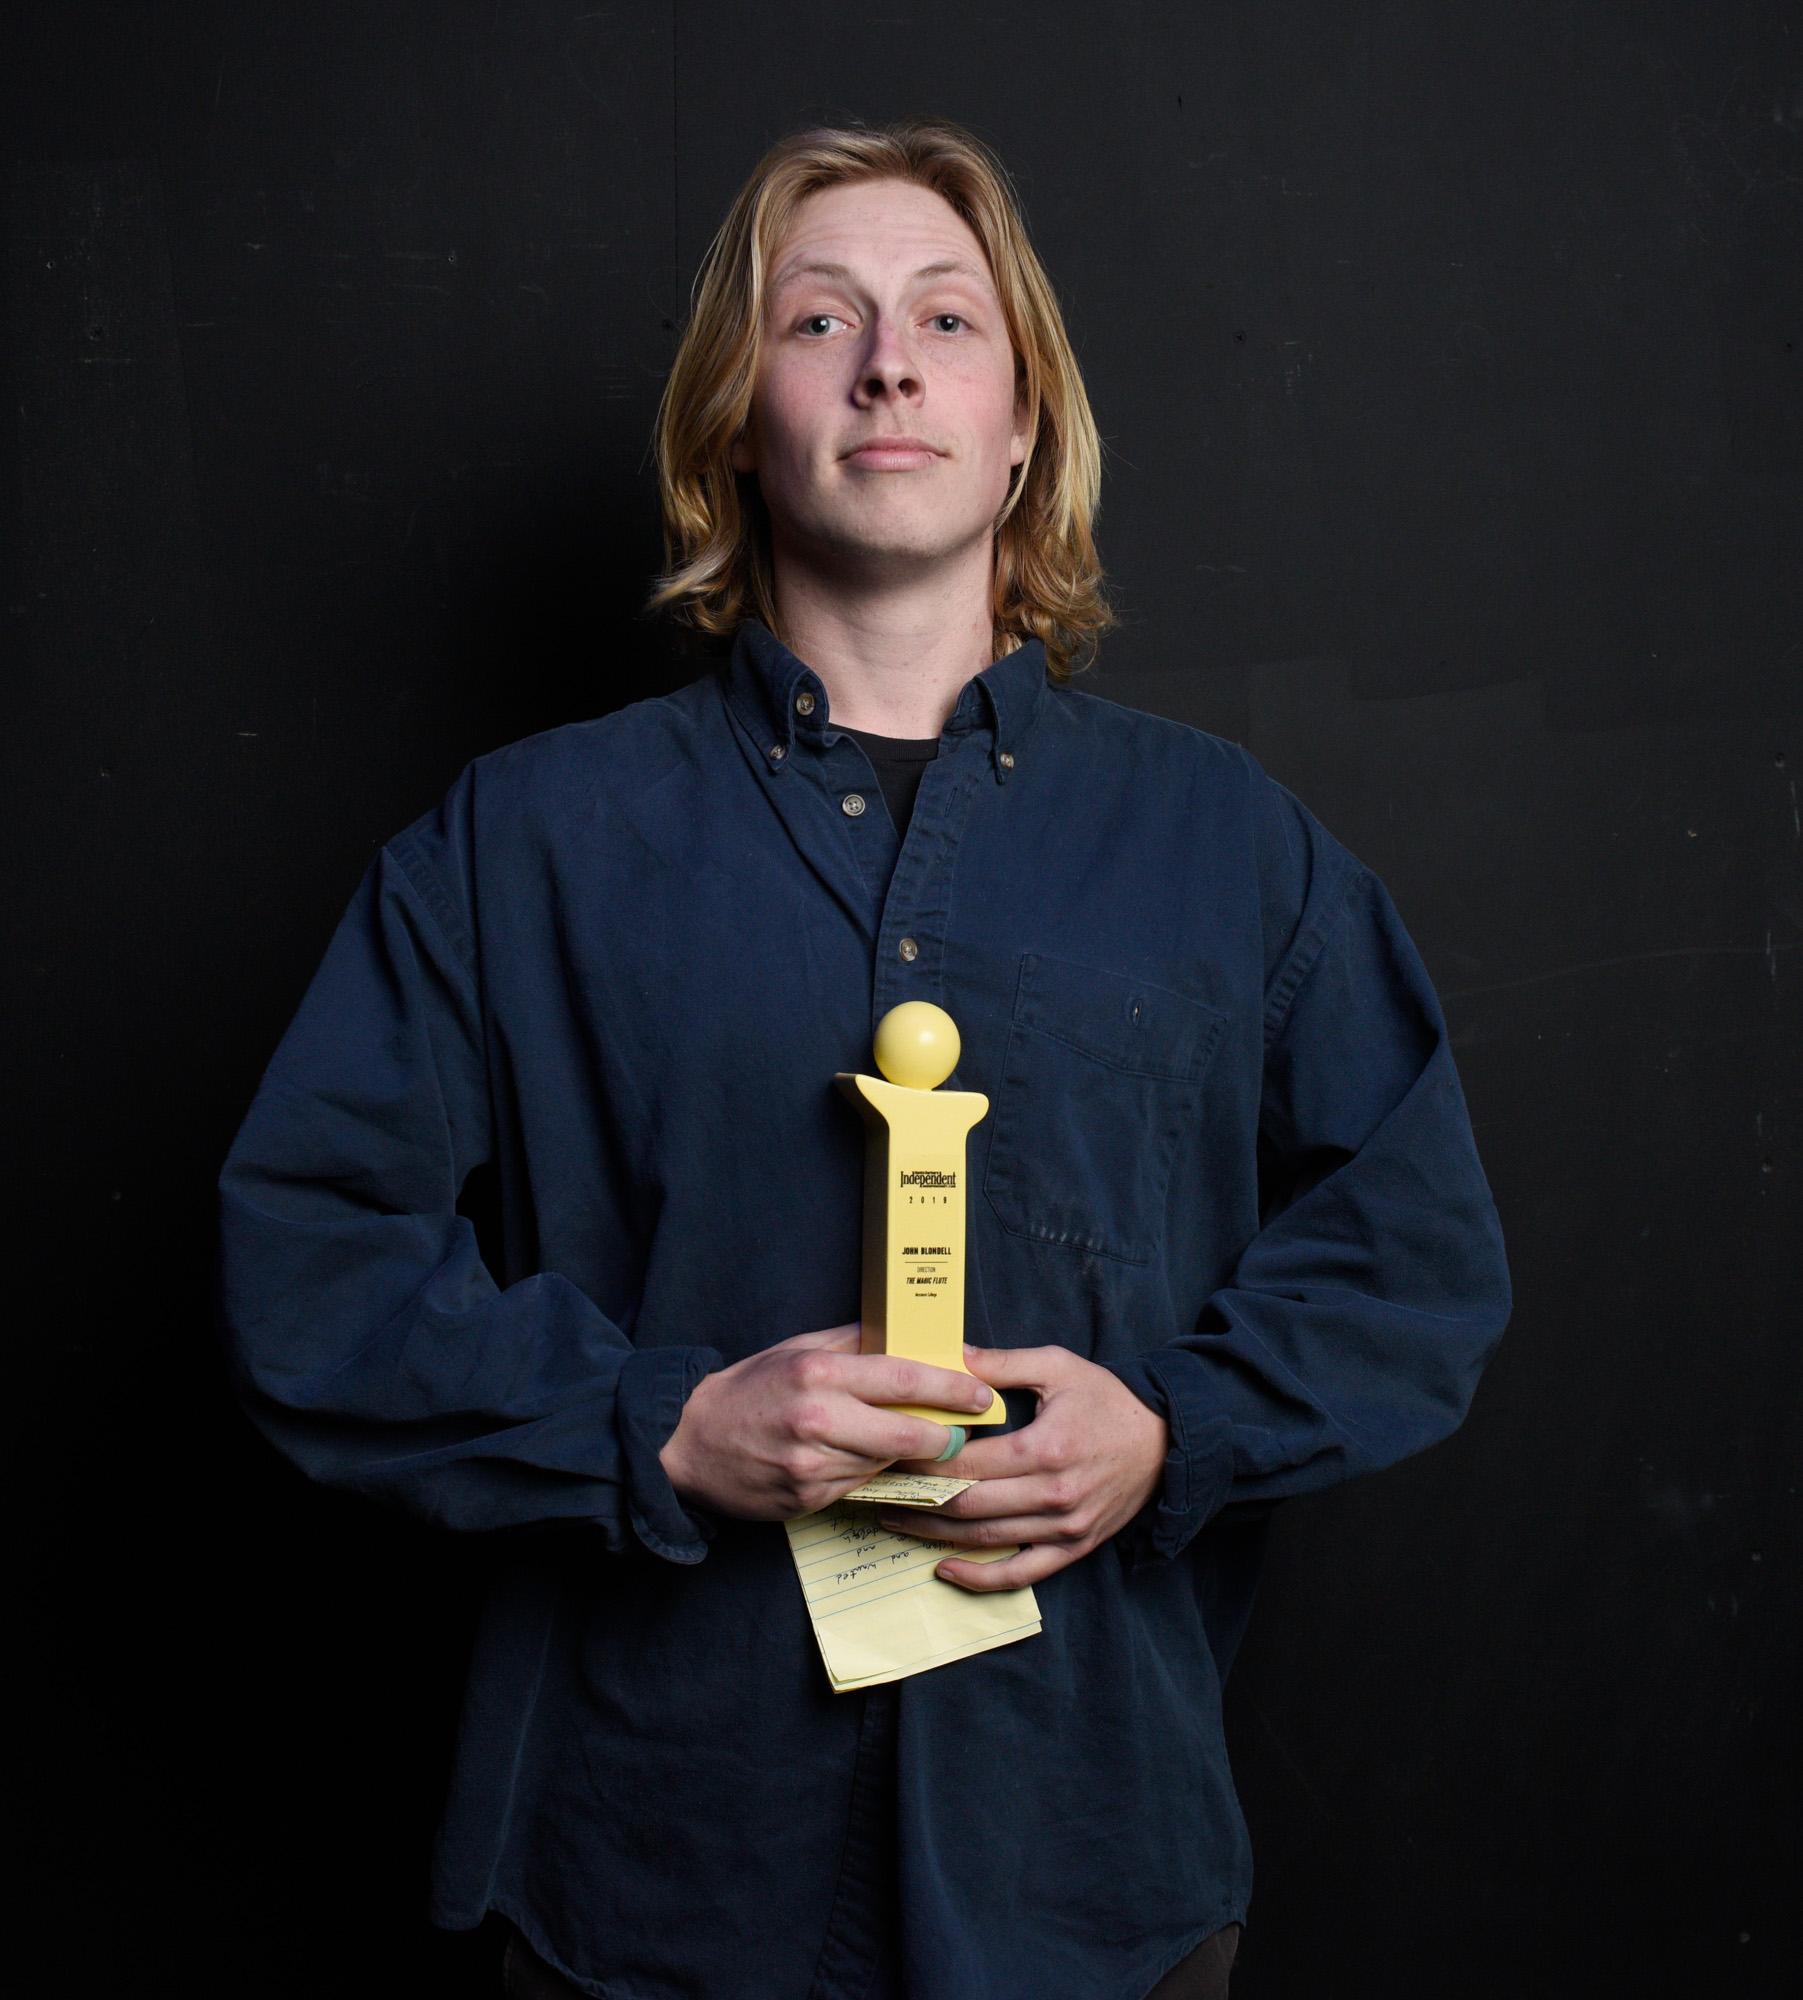 2019 Inday Award Winner